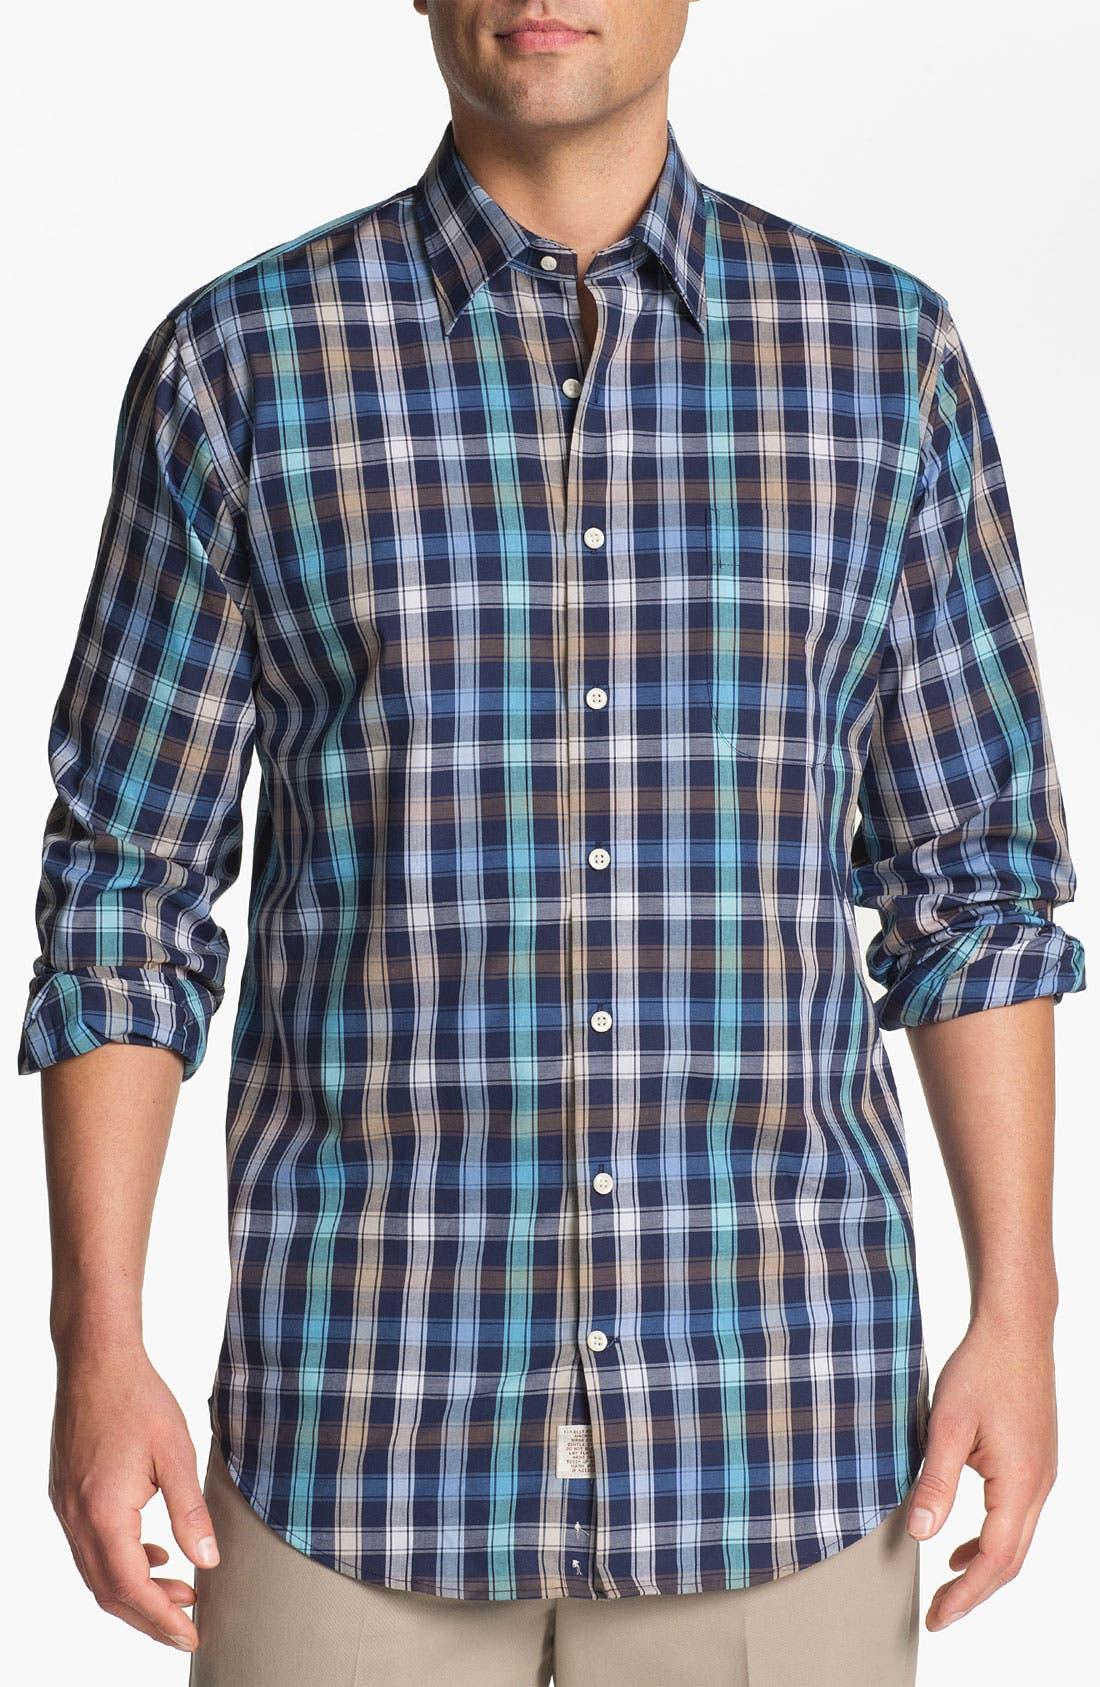 Alternate Image 1 Selected - Peter Millar 'Double Track' Regular Fit Sport Shirt